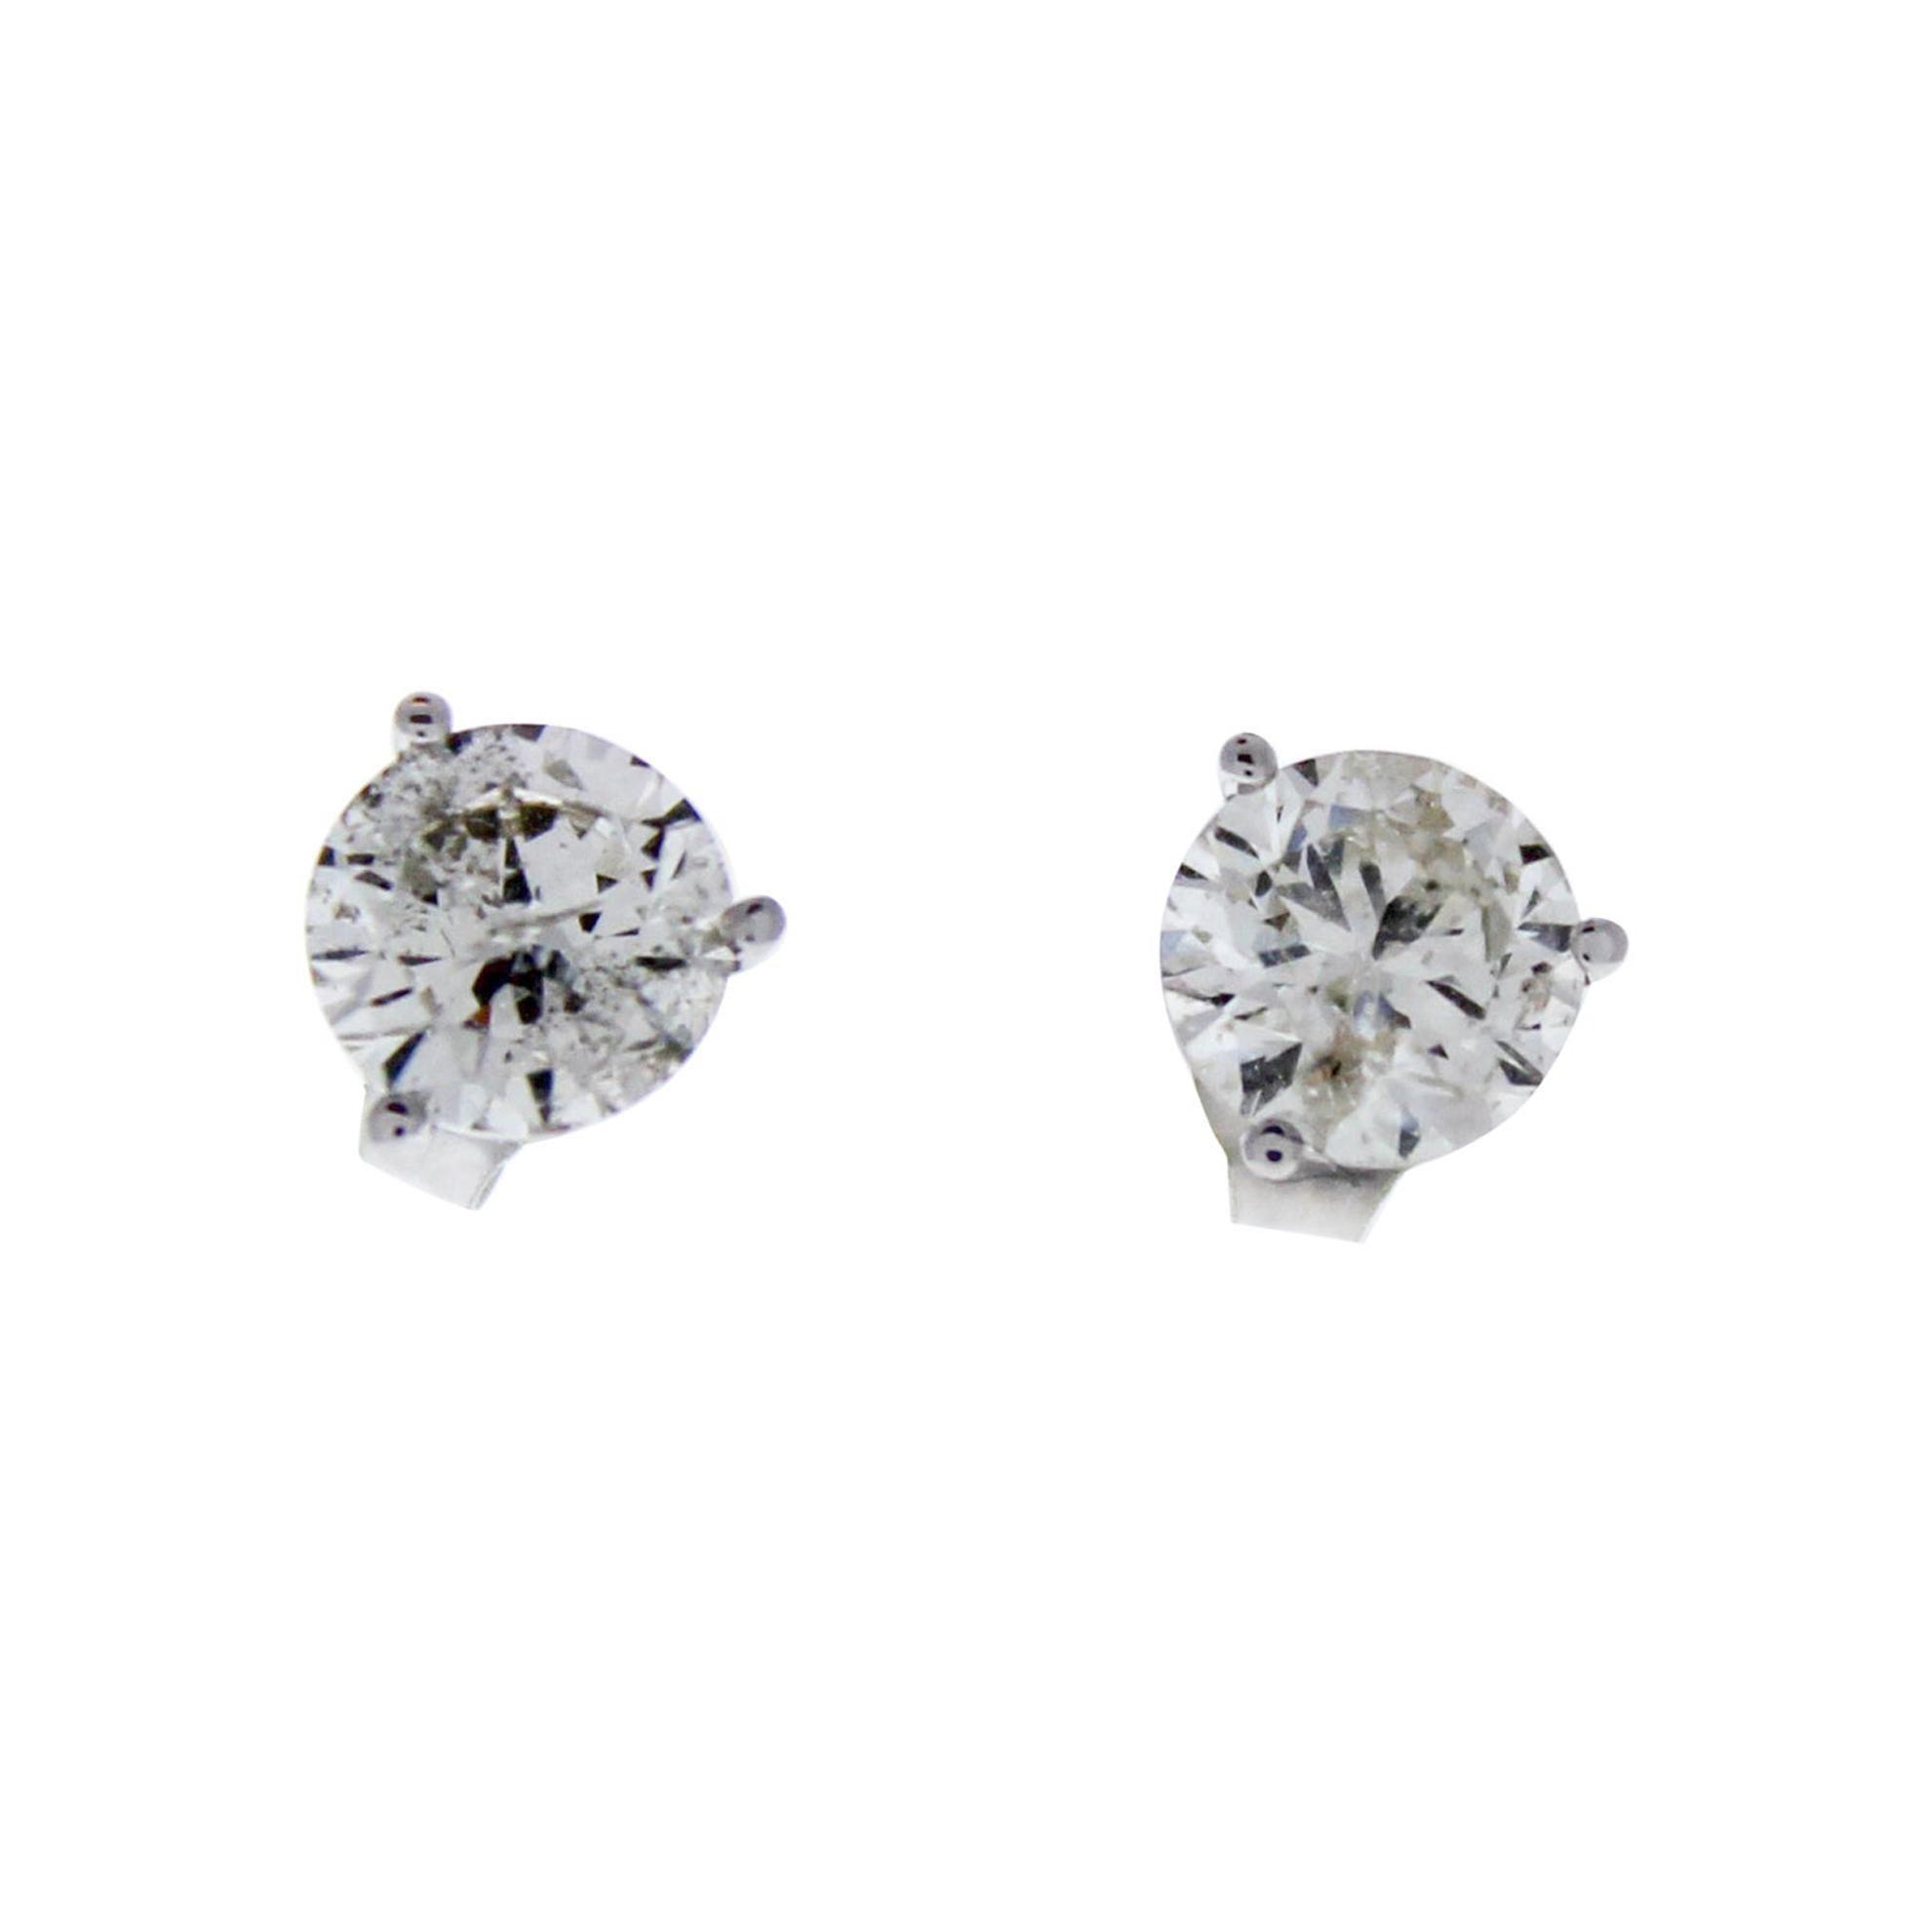 1.75 Carat Total Round Diamond Stud Earrings in 14k White Gold